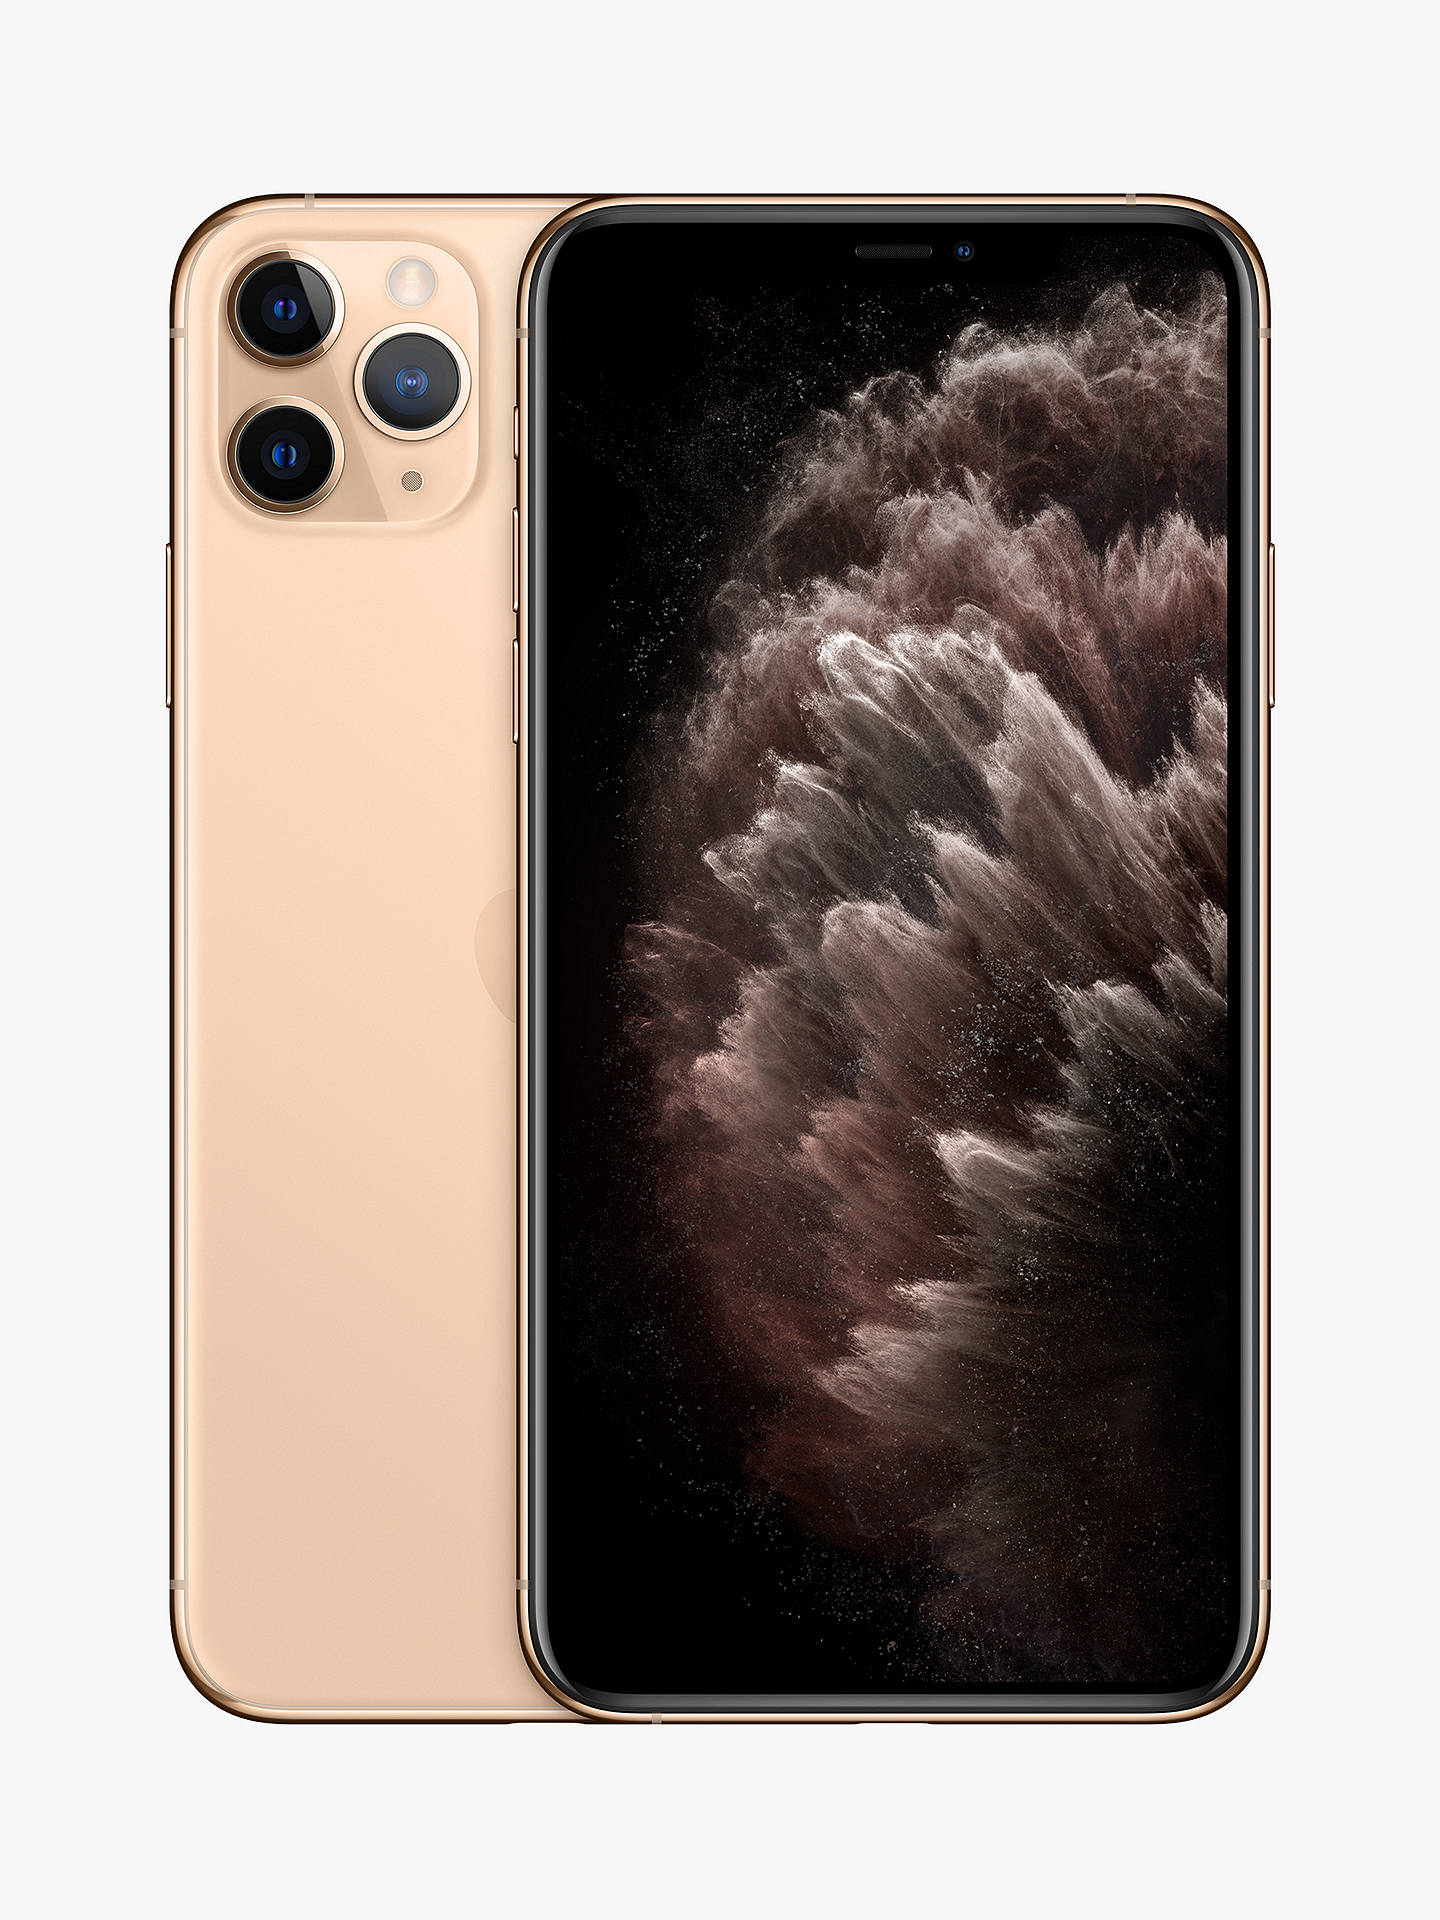 Apple Iphone 11 Pro Max Ios 6 5 4g Lte Sim Free 512gb At John Lewis Partners